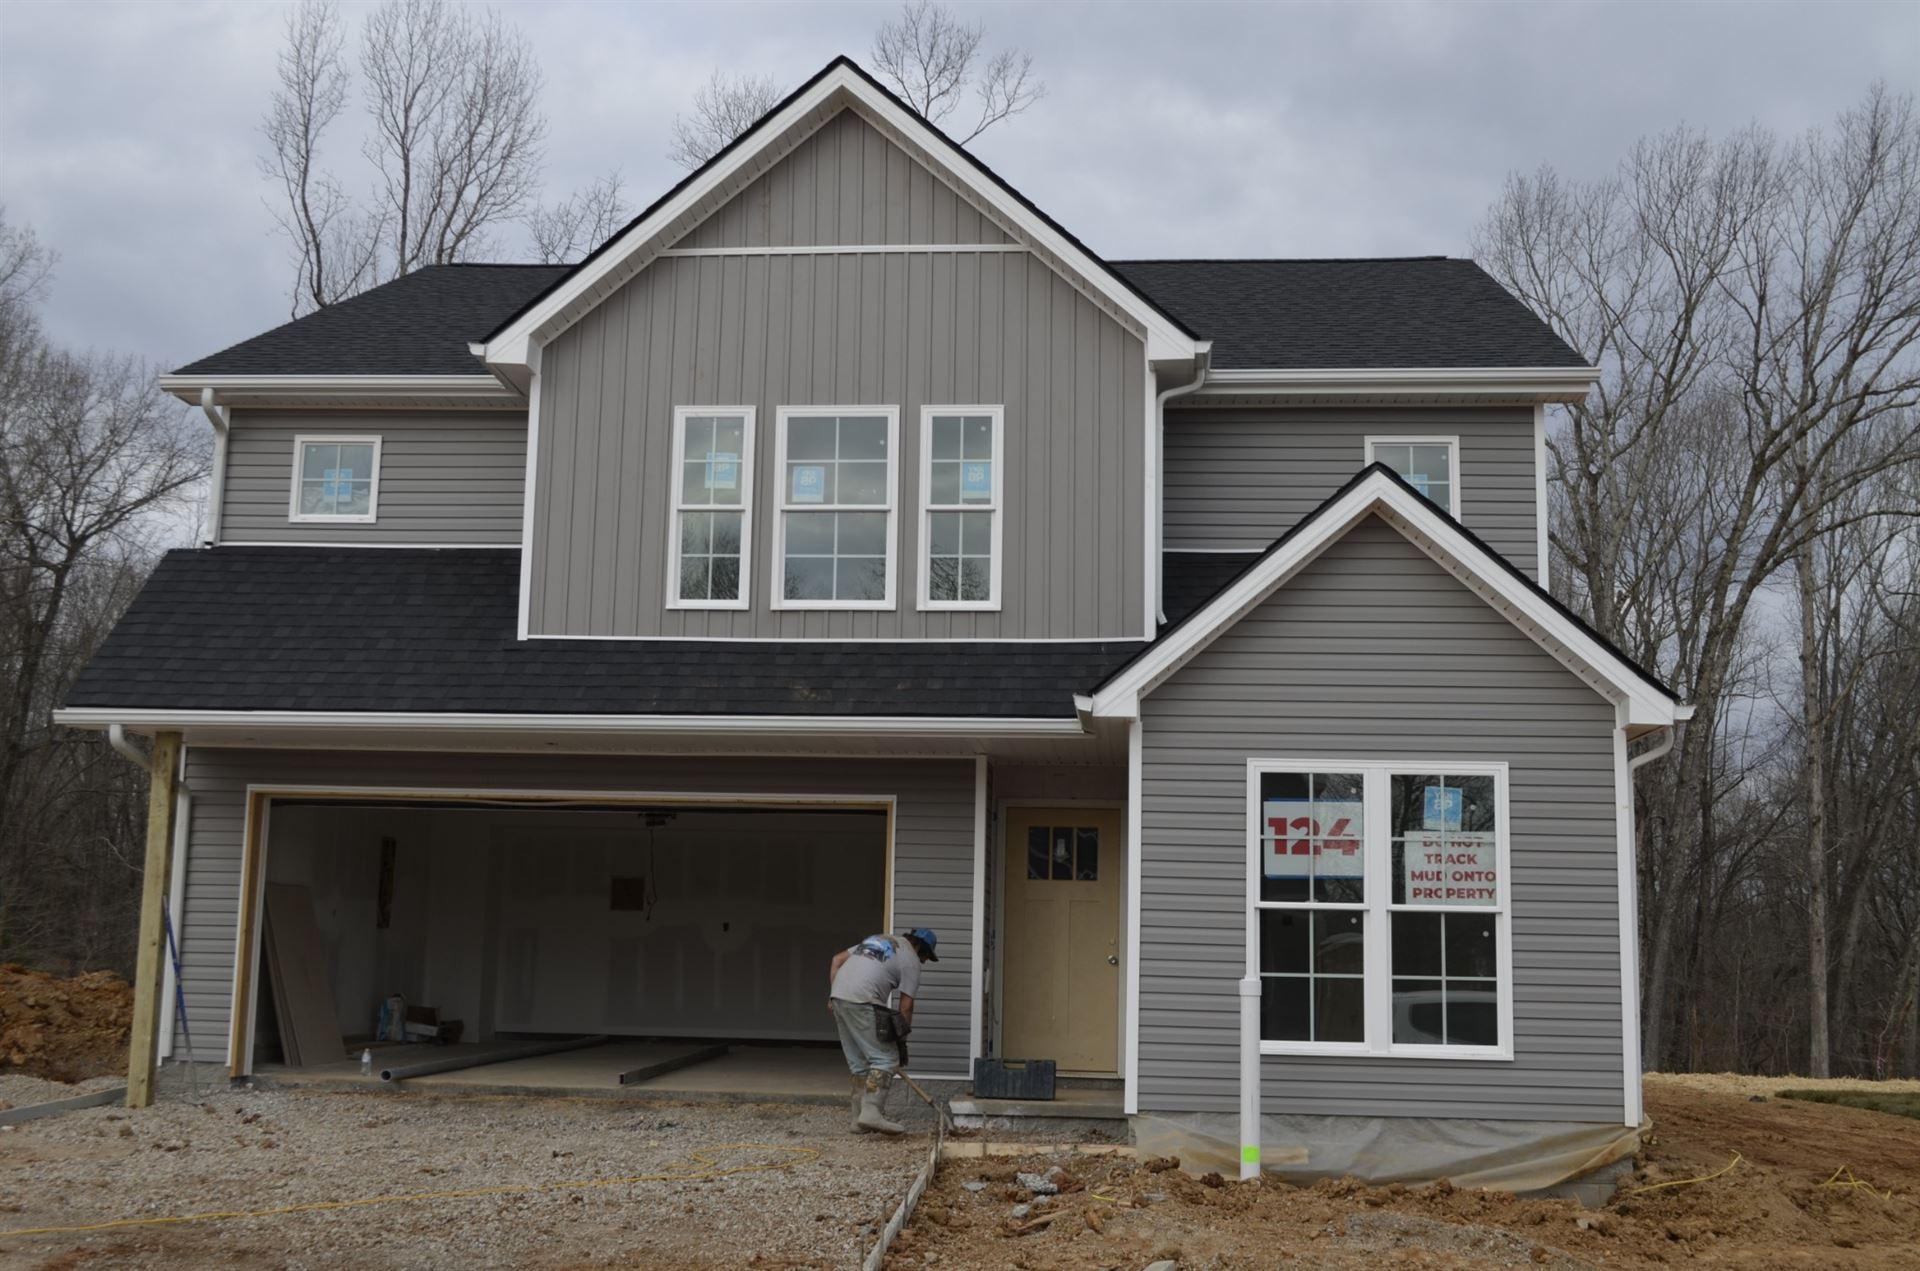 116 Schroer Rd, Clarksville, TN 37042 - MLS#: 2216839